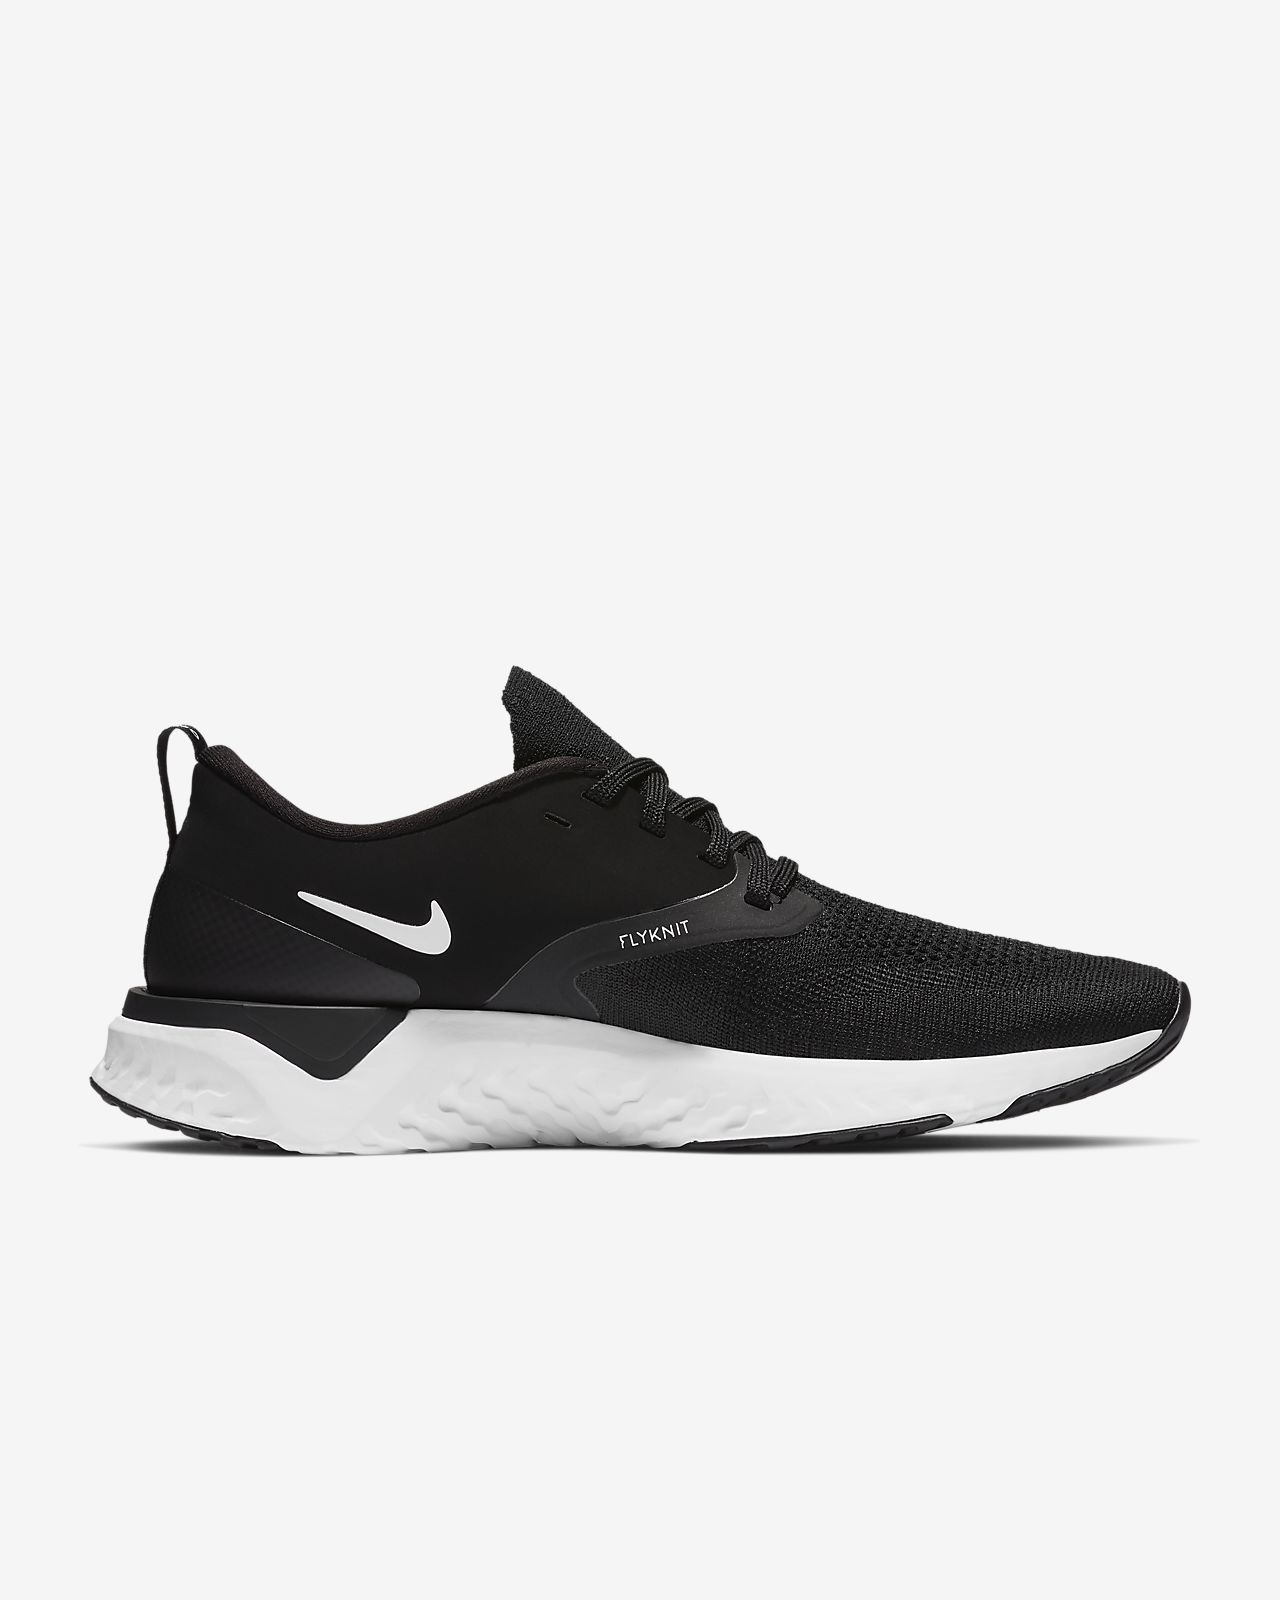 Nike: Nike LunarGlide 9 iD | Milled